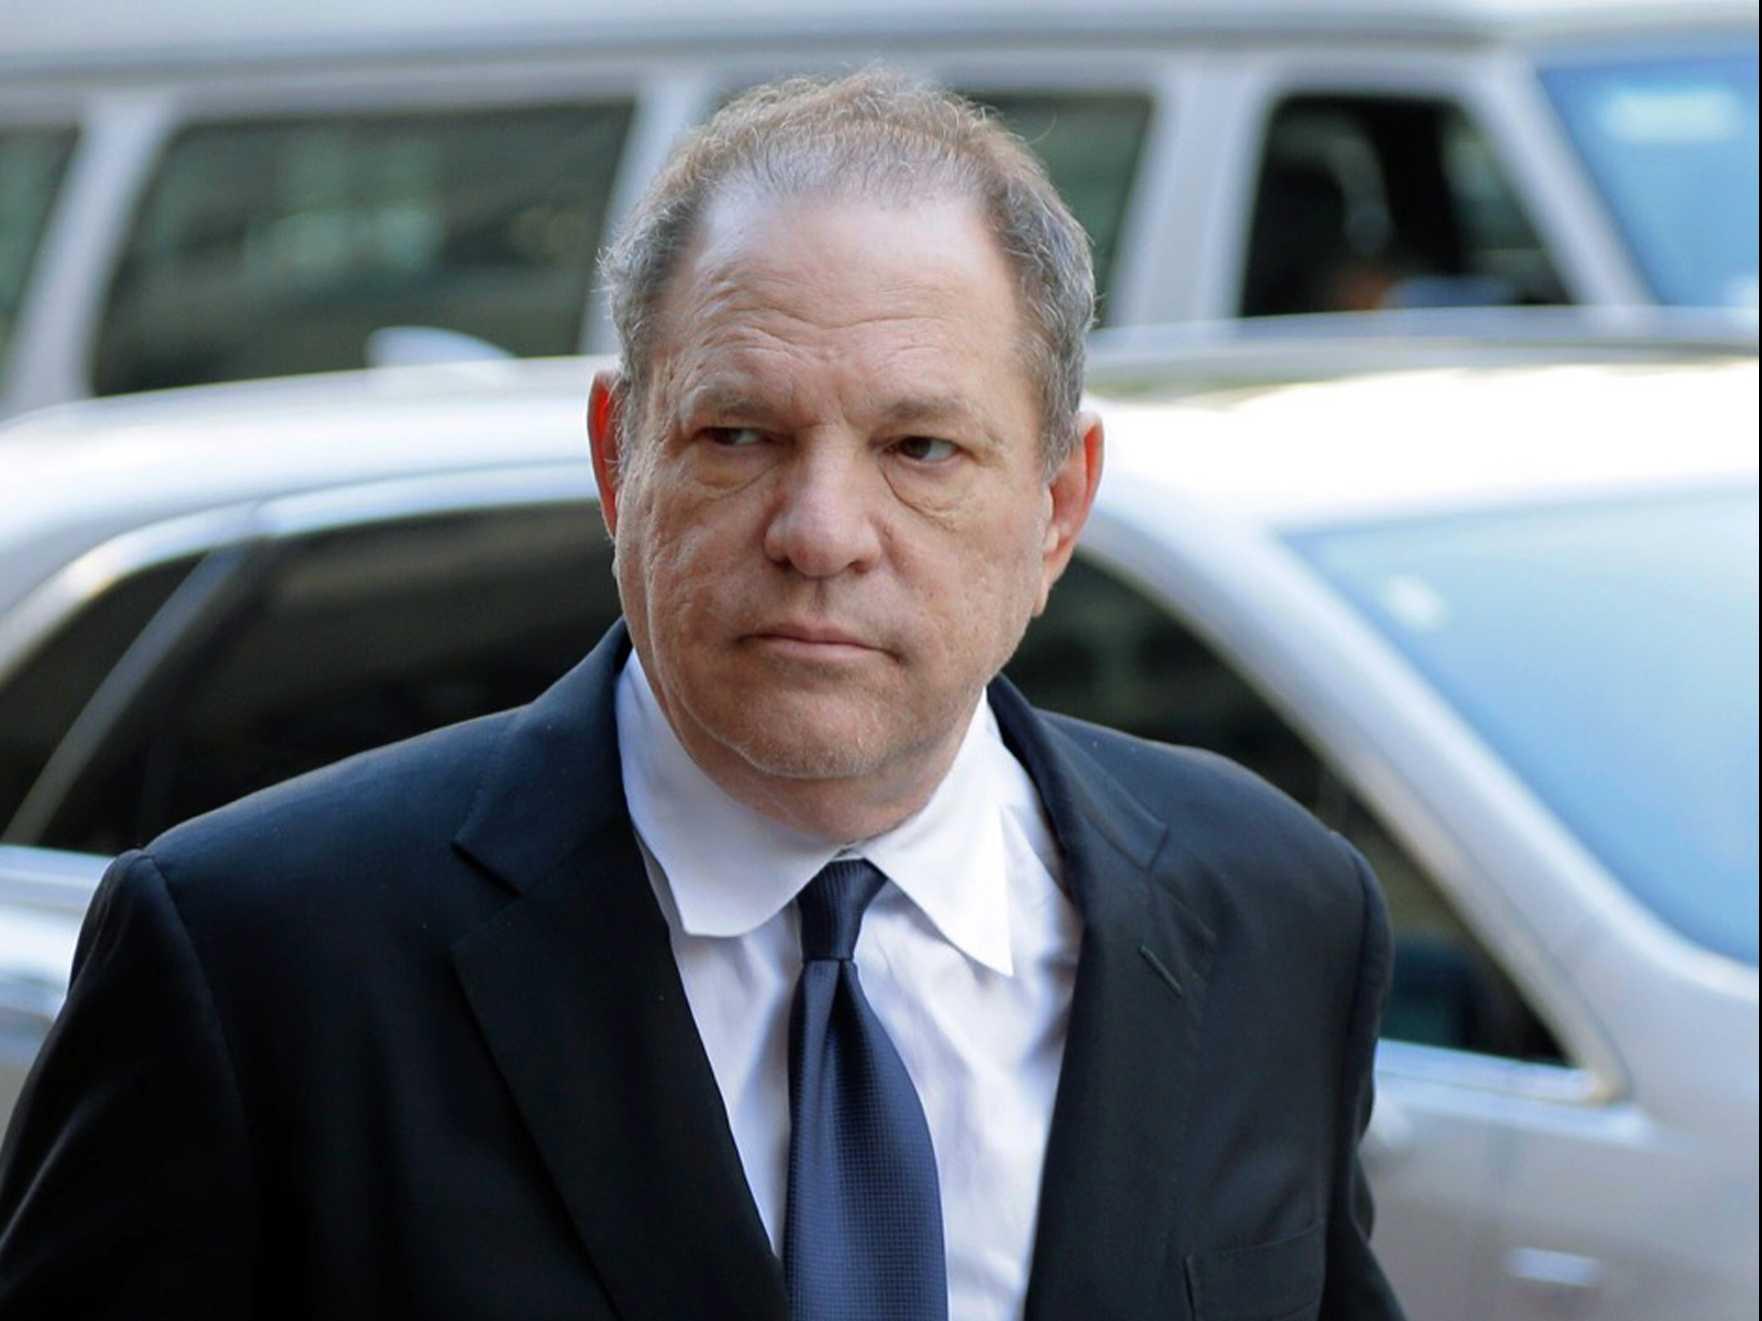 'Stop this Chaos:' Weinstein Lawyer Urges Sex Case Dismissal